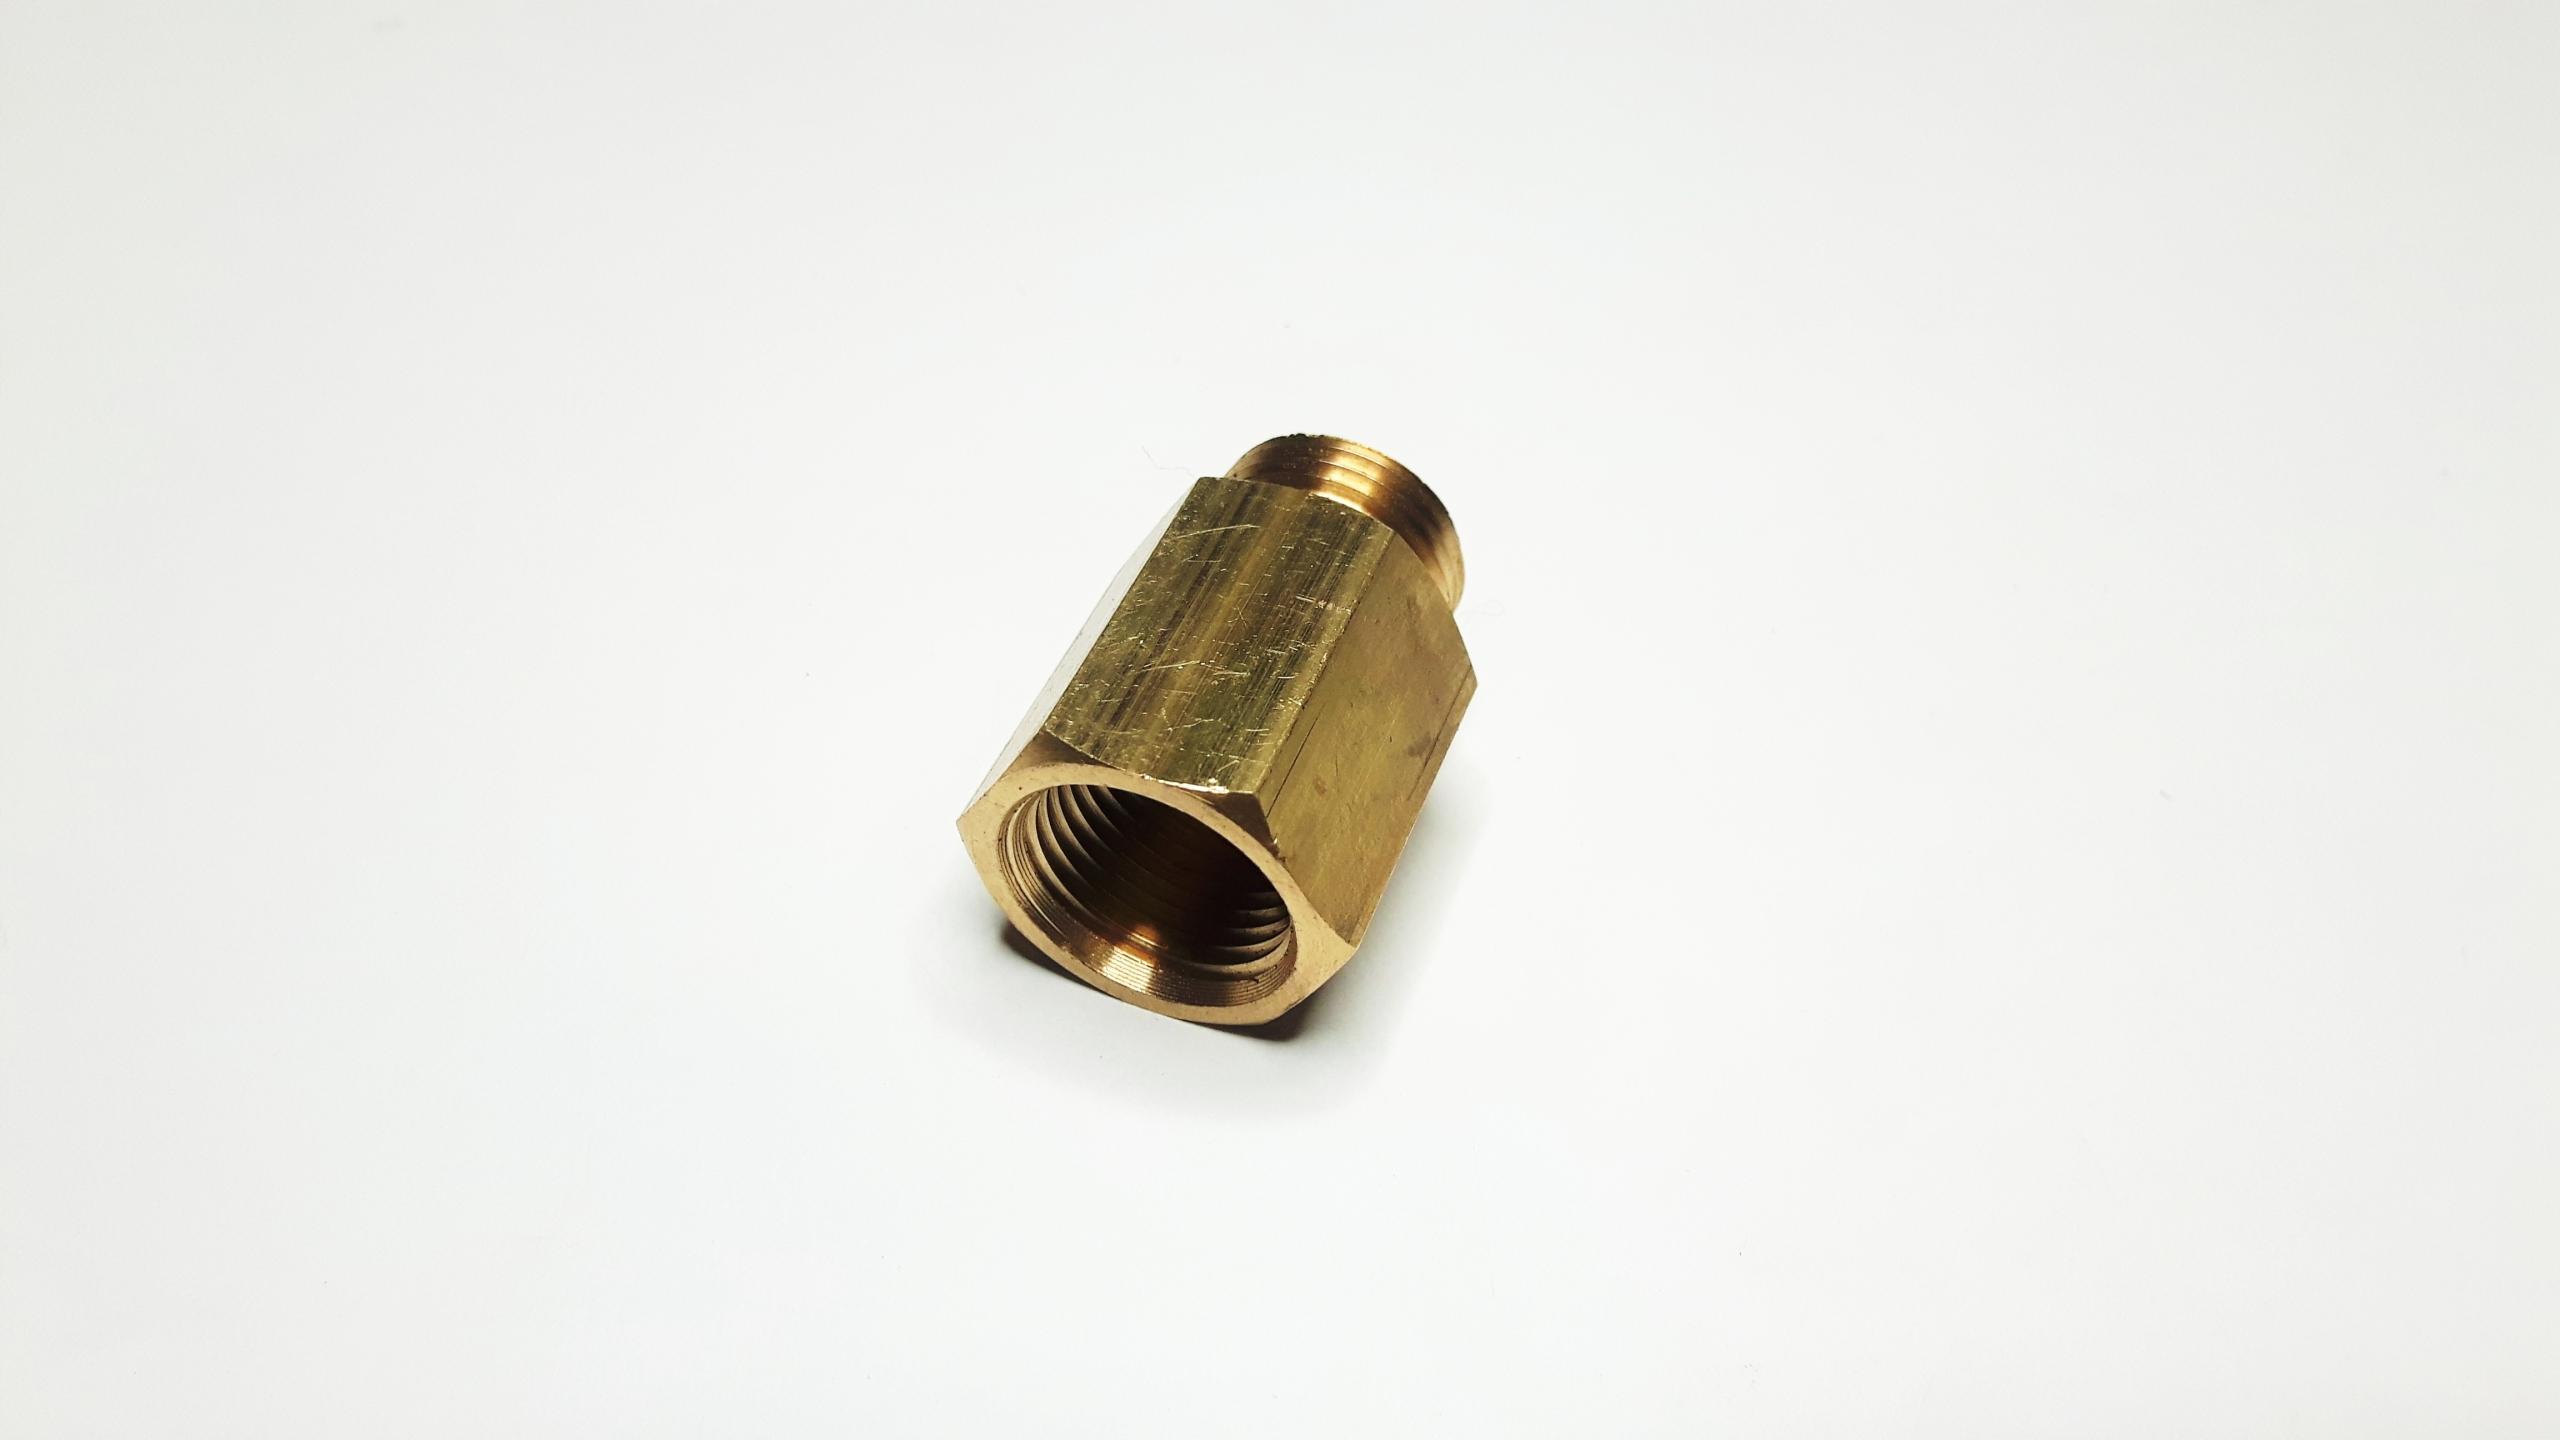 эмулятор зонда лямбда - латунный краткое 4mm